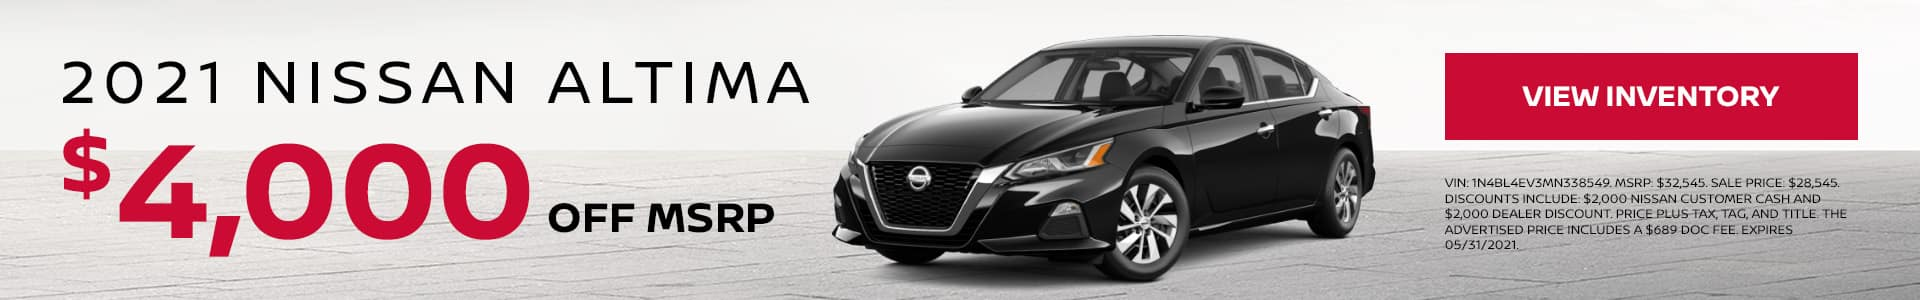 2021 Nissan Altima $4,000 off MSRP